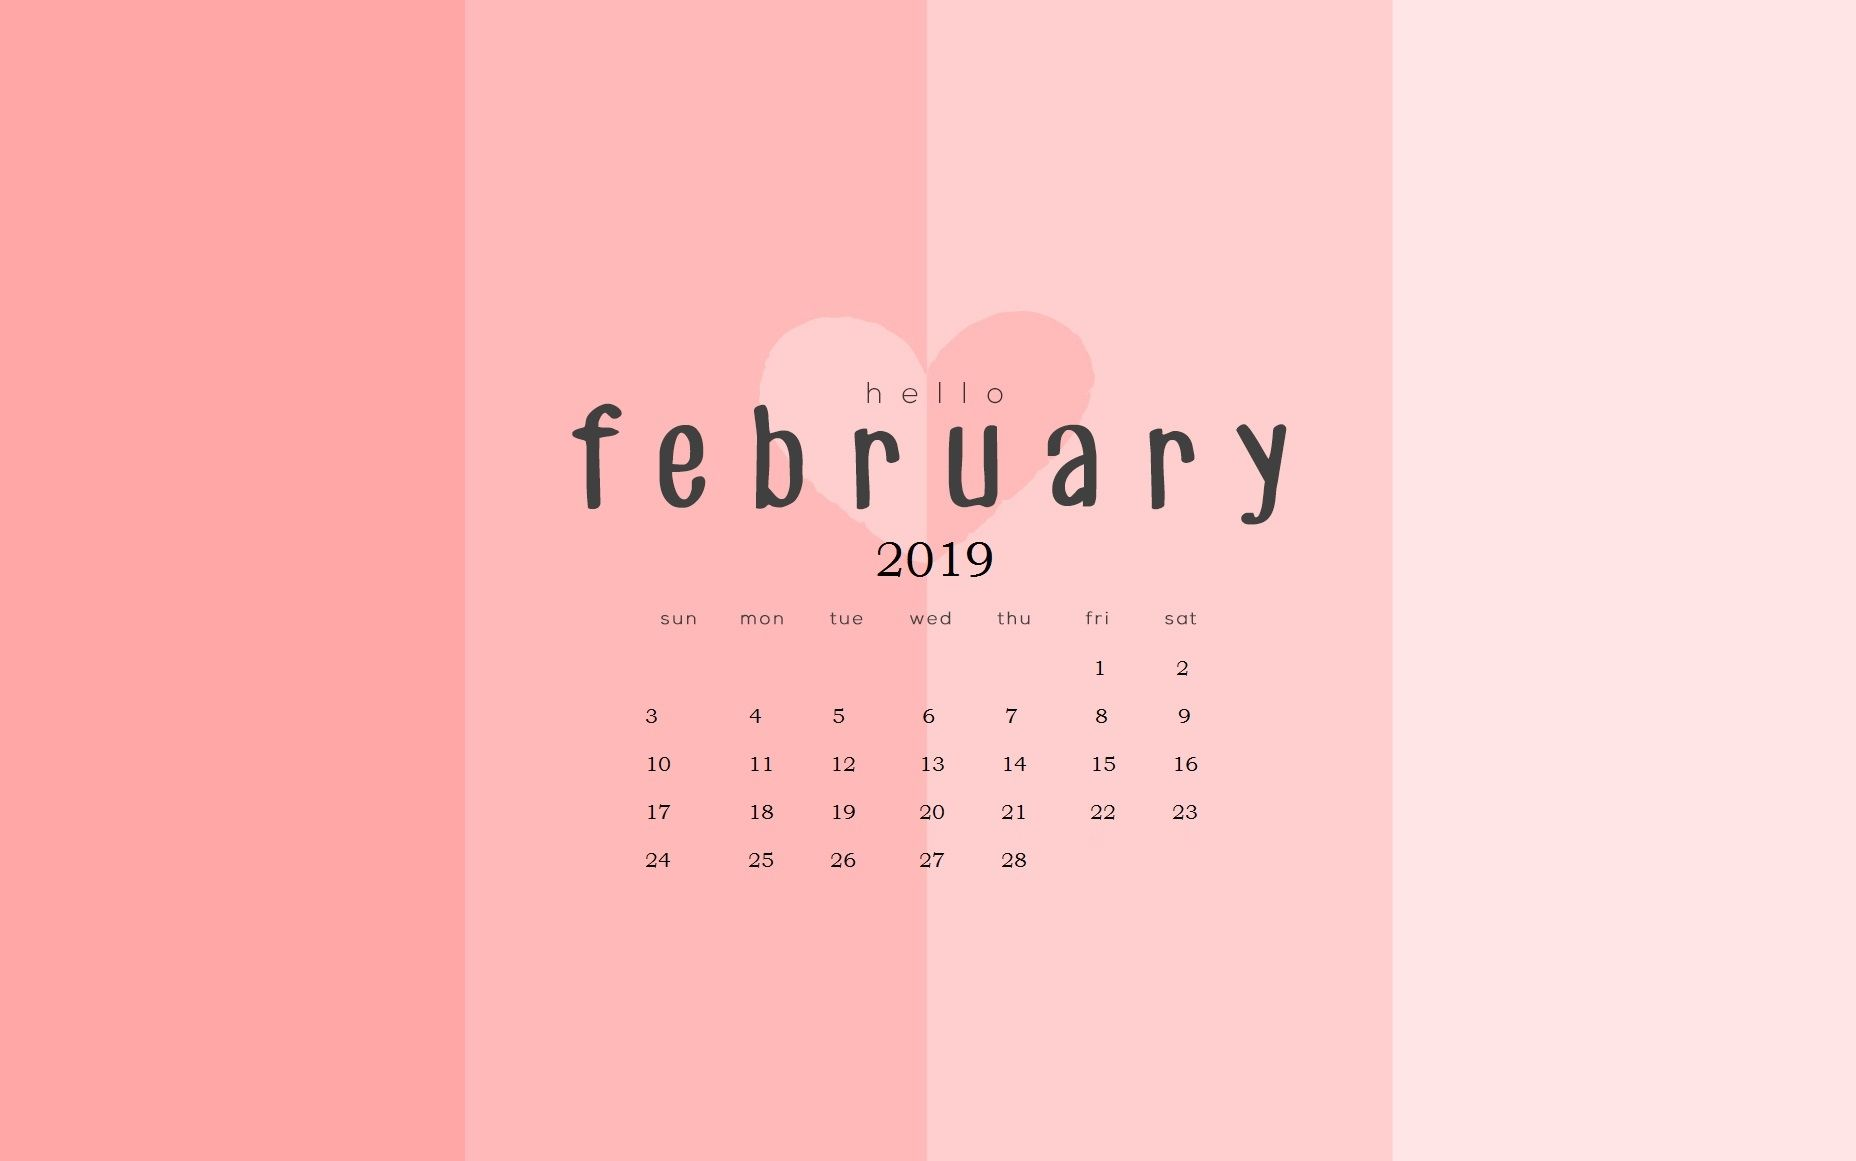 February 2019 Calendar Wallpaper Phone february 2019 calendar wallpapers calendar 2019february 2019